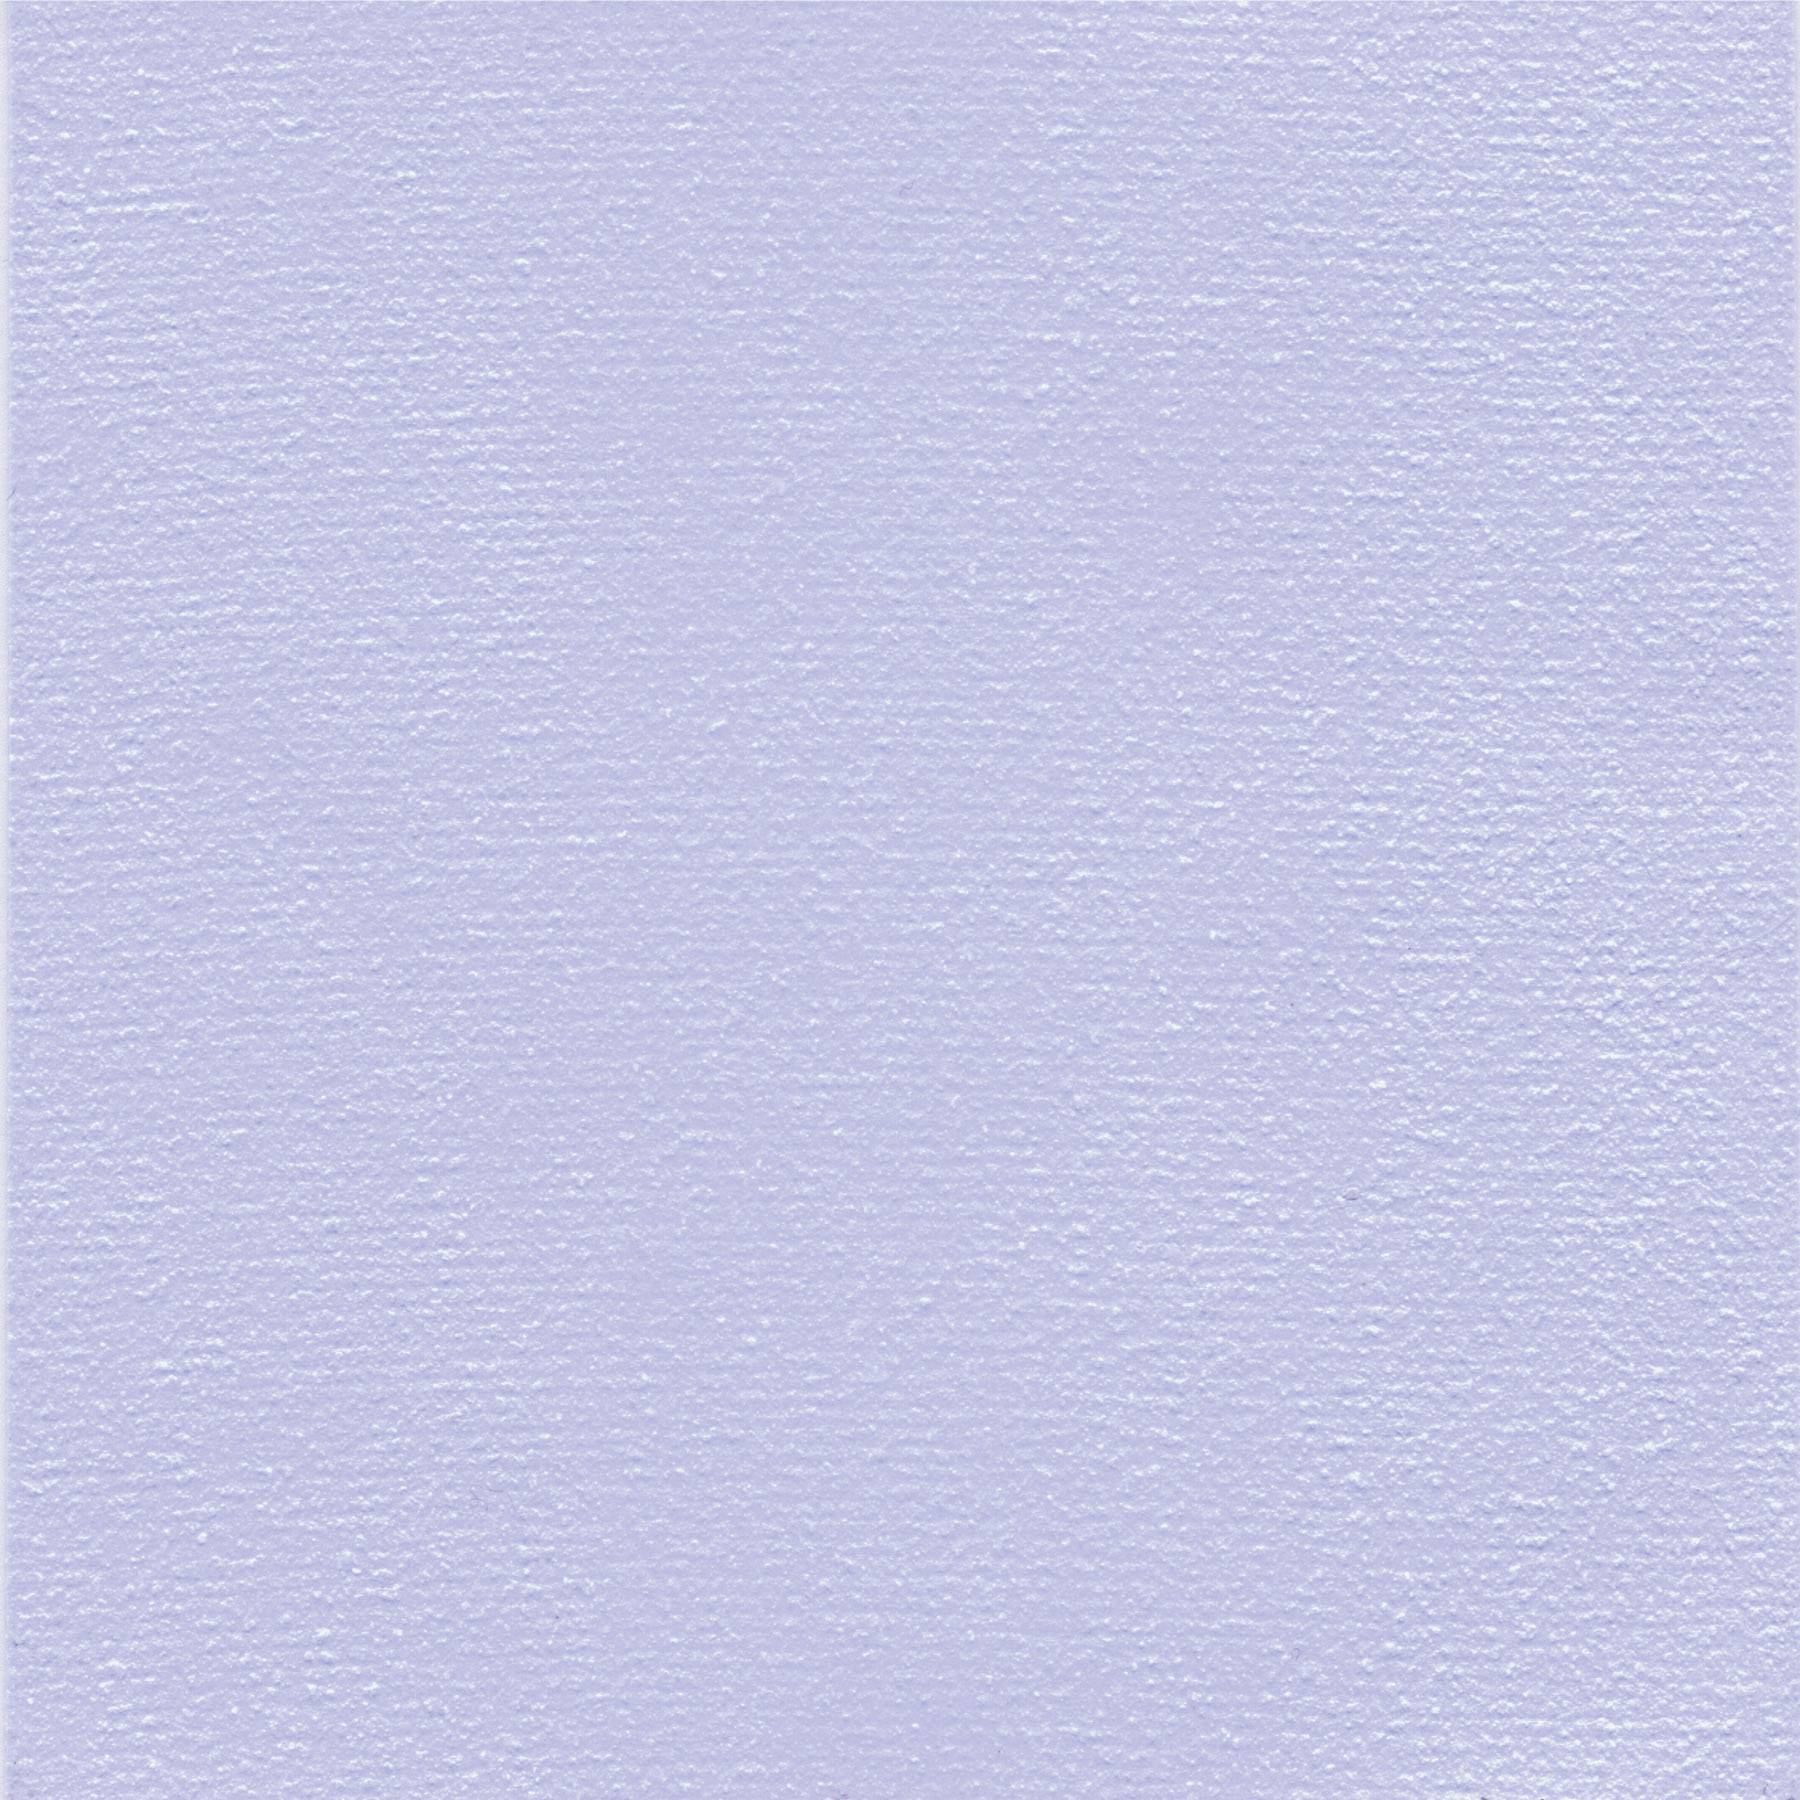 Teplovodivá fólia Kerafol SOFTTHERM 86/300, 2 mm, 3 W/mK, (d x š) 100 mm x 100 mm